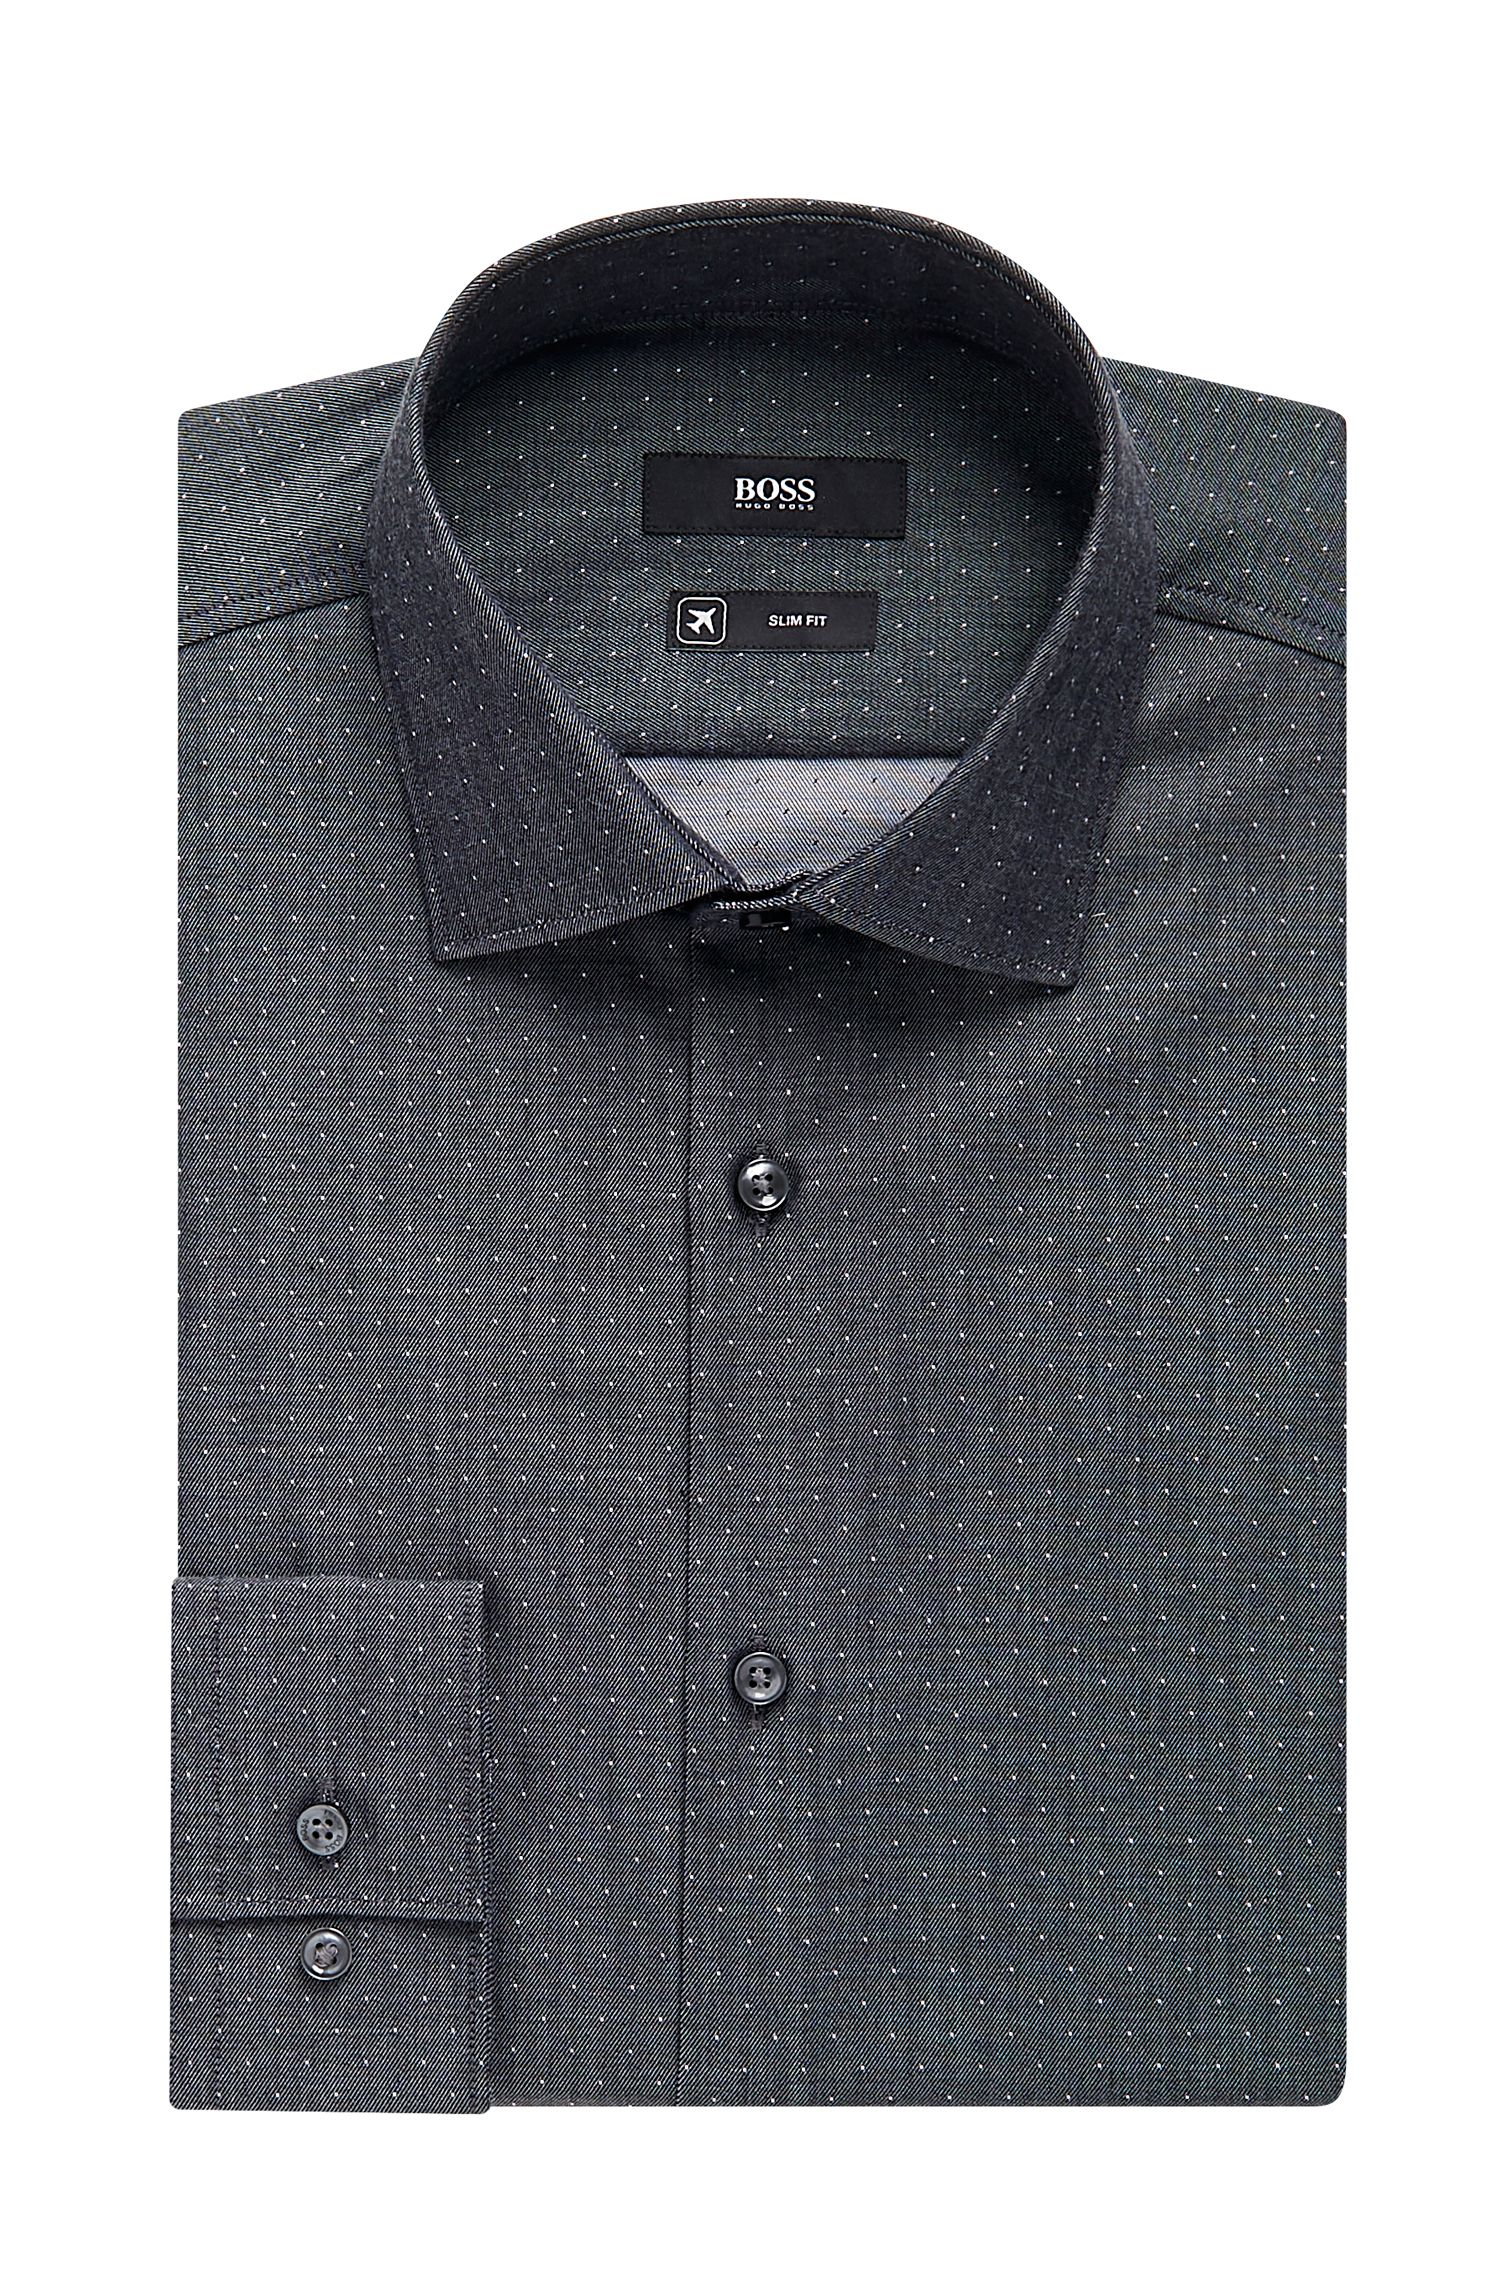 'Ismo' | Slim Fit, Traveler Microdot Cotton Dress Shirt